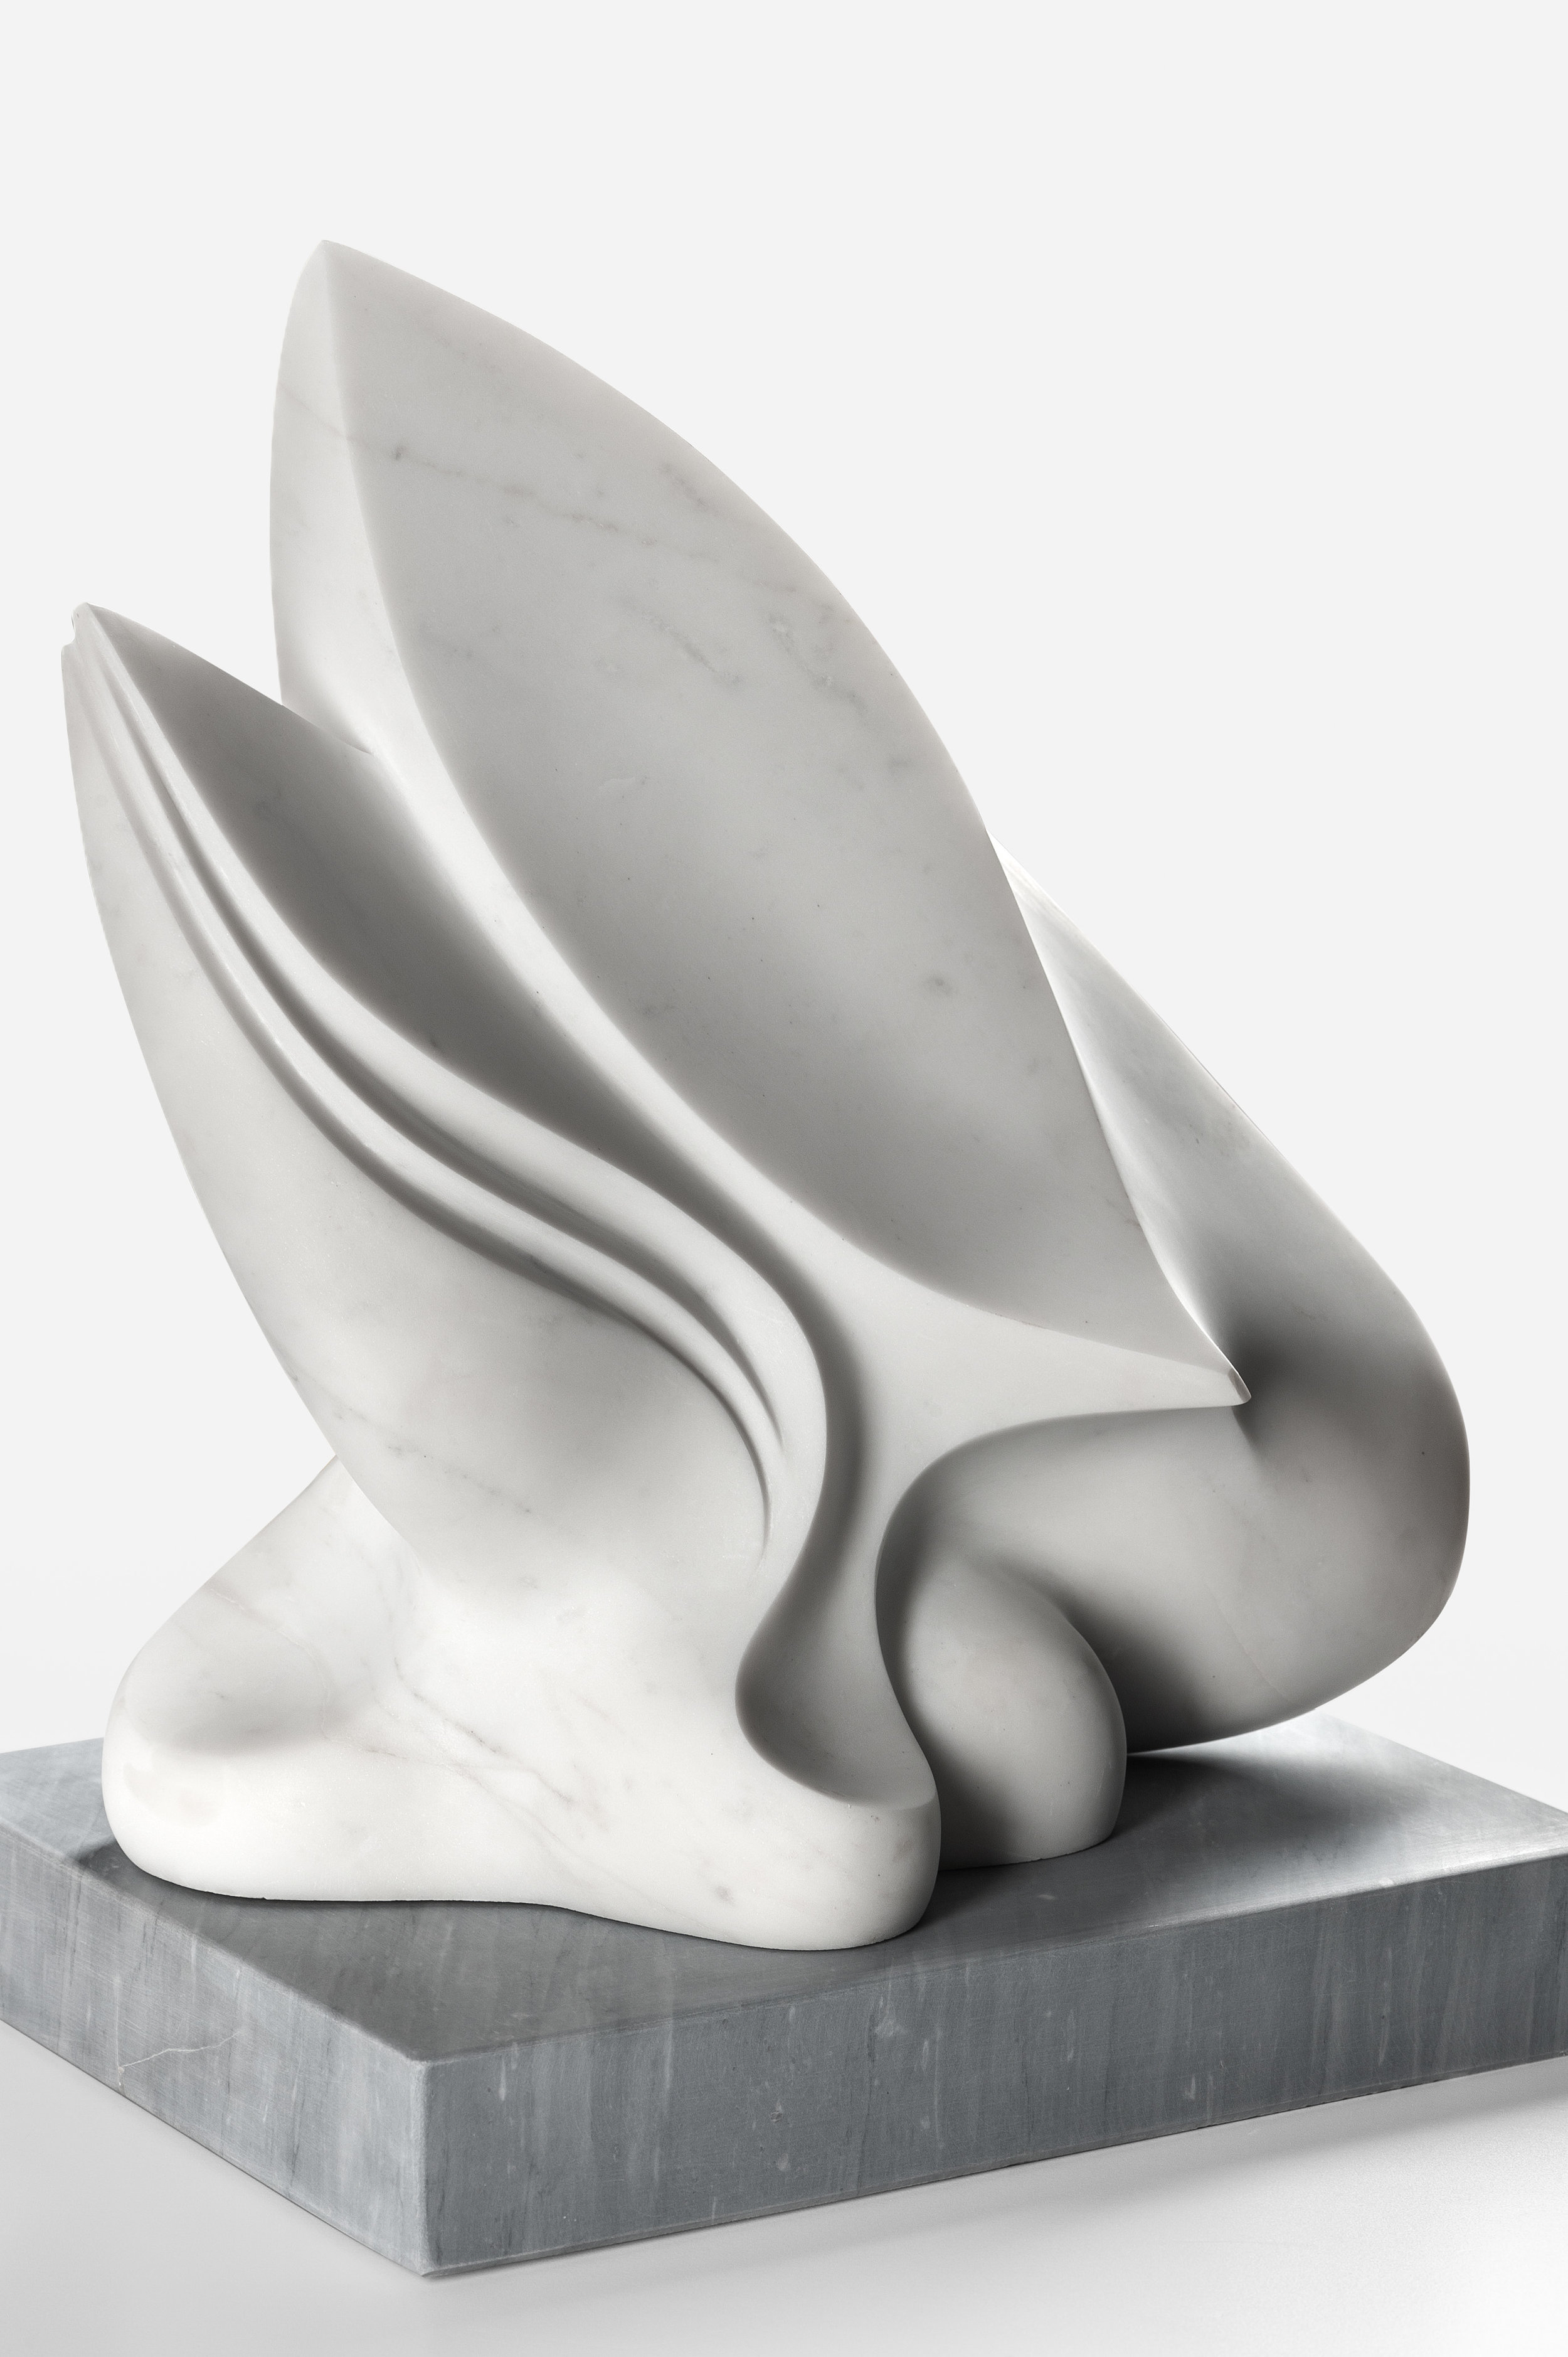 artemis_sculpture_yoko_kubrick.jpg